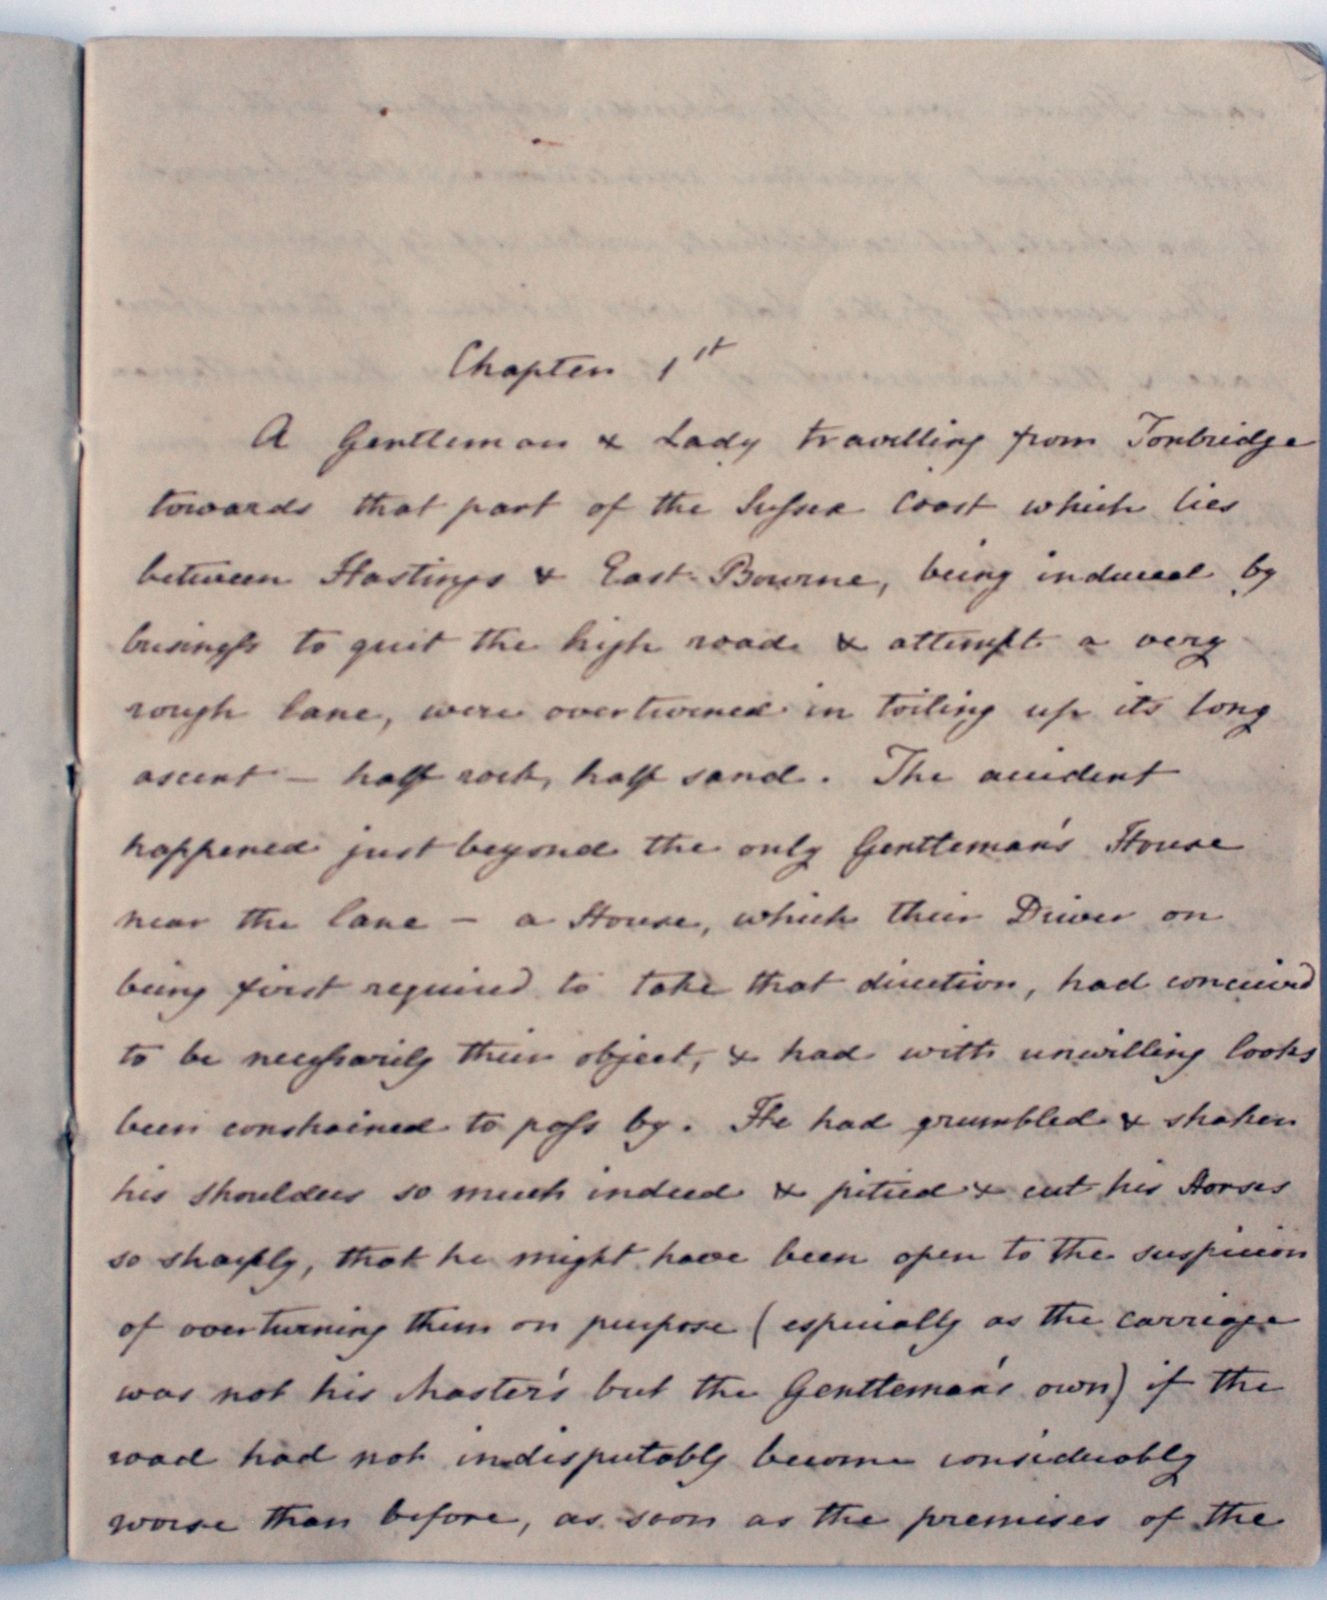 First page of Cassandra's handwritten copy of Sanditon